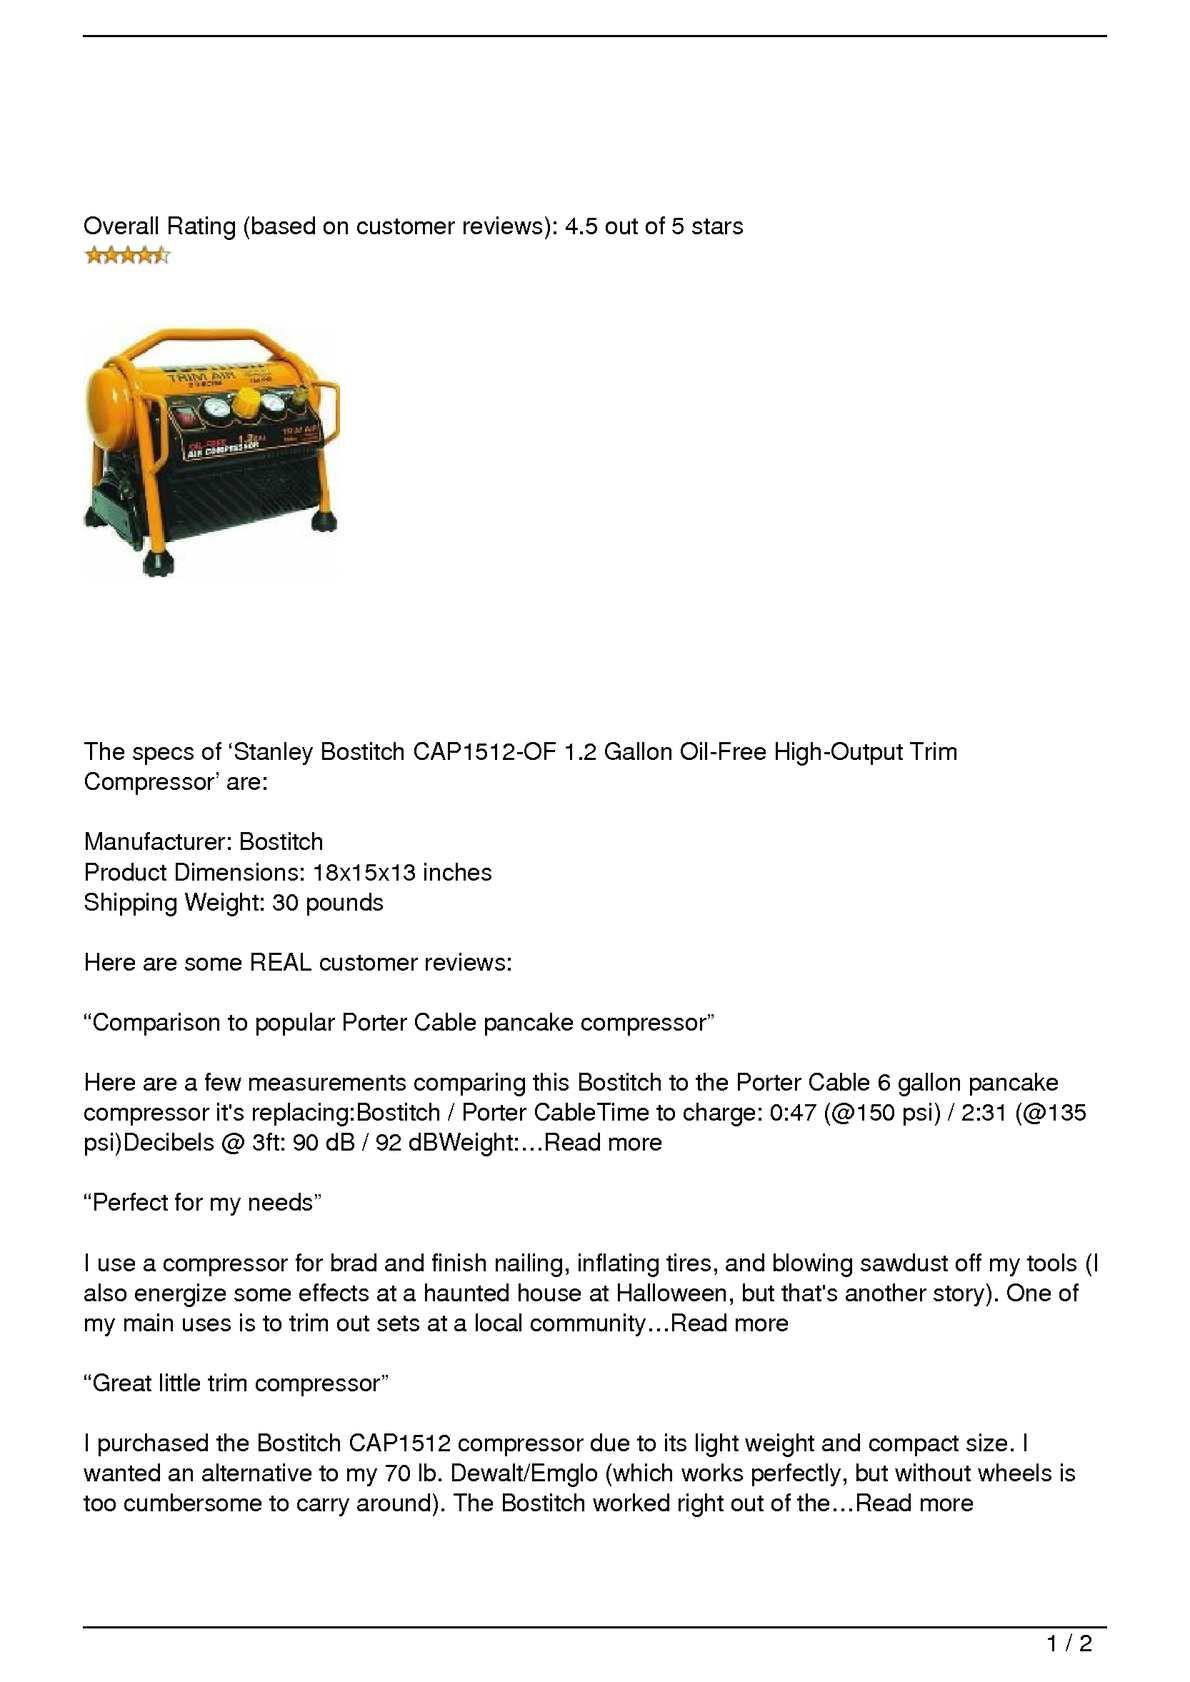 Calaméo - Stanley Bostitch CAP1512-OF 1 2 Gallon Oil-Free